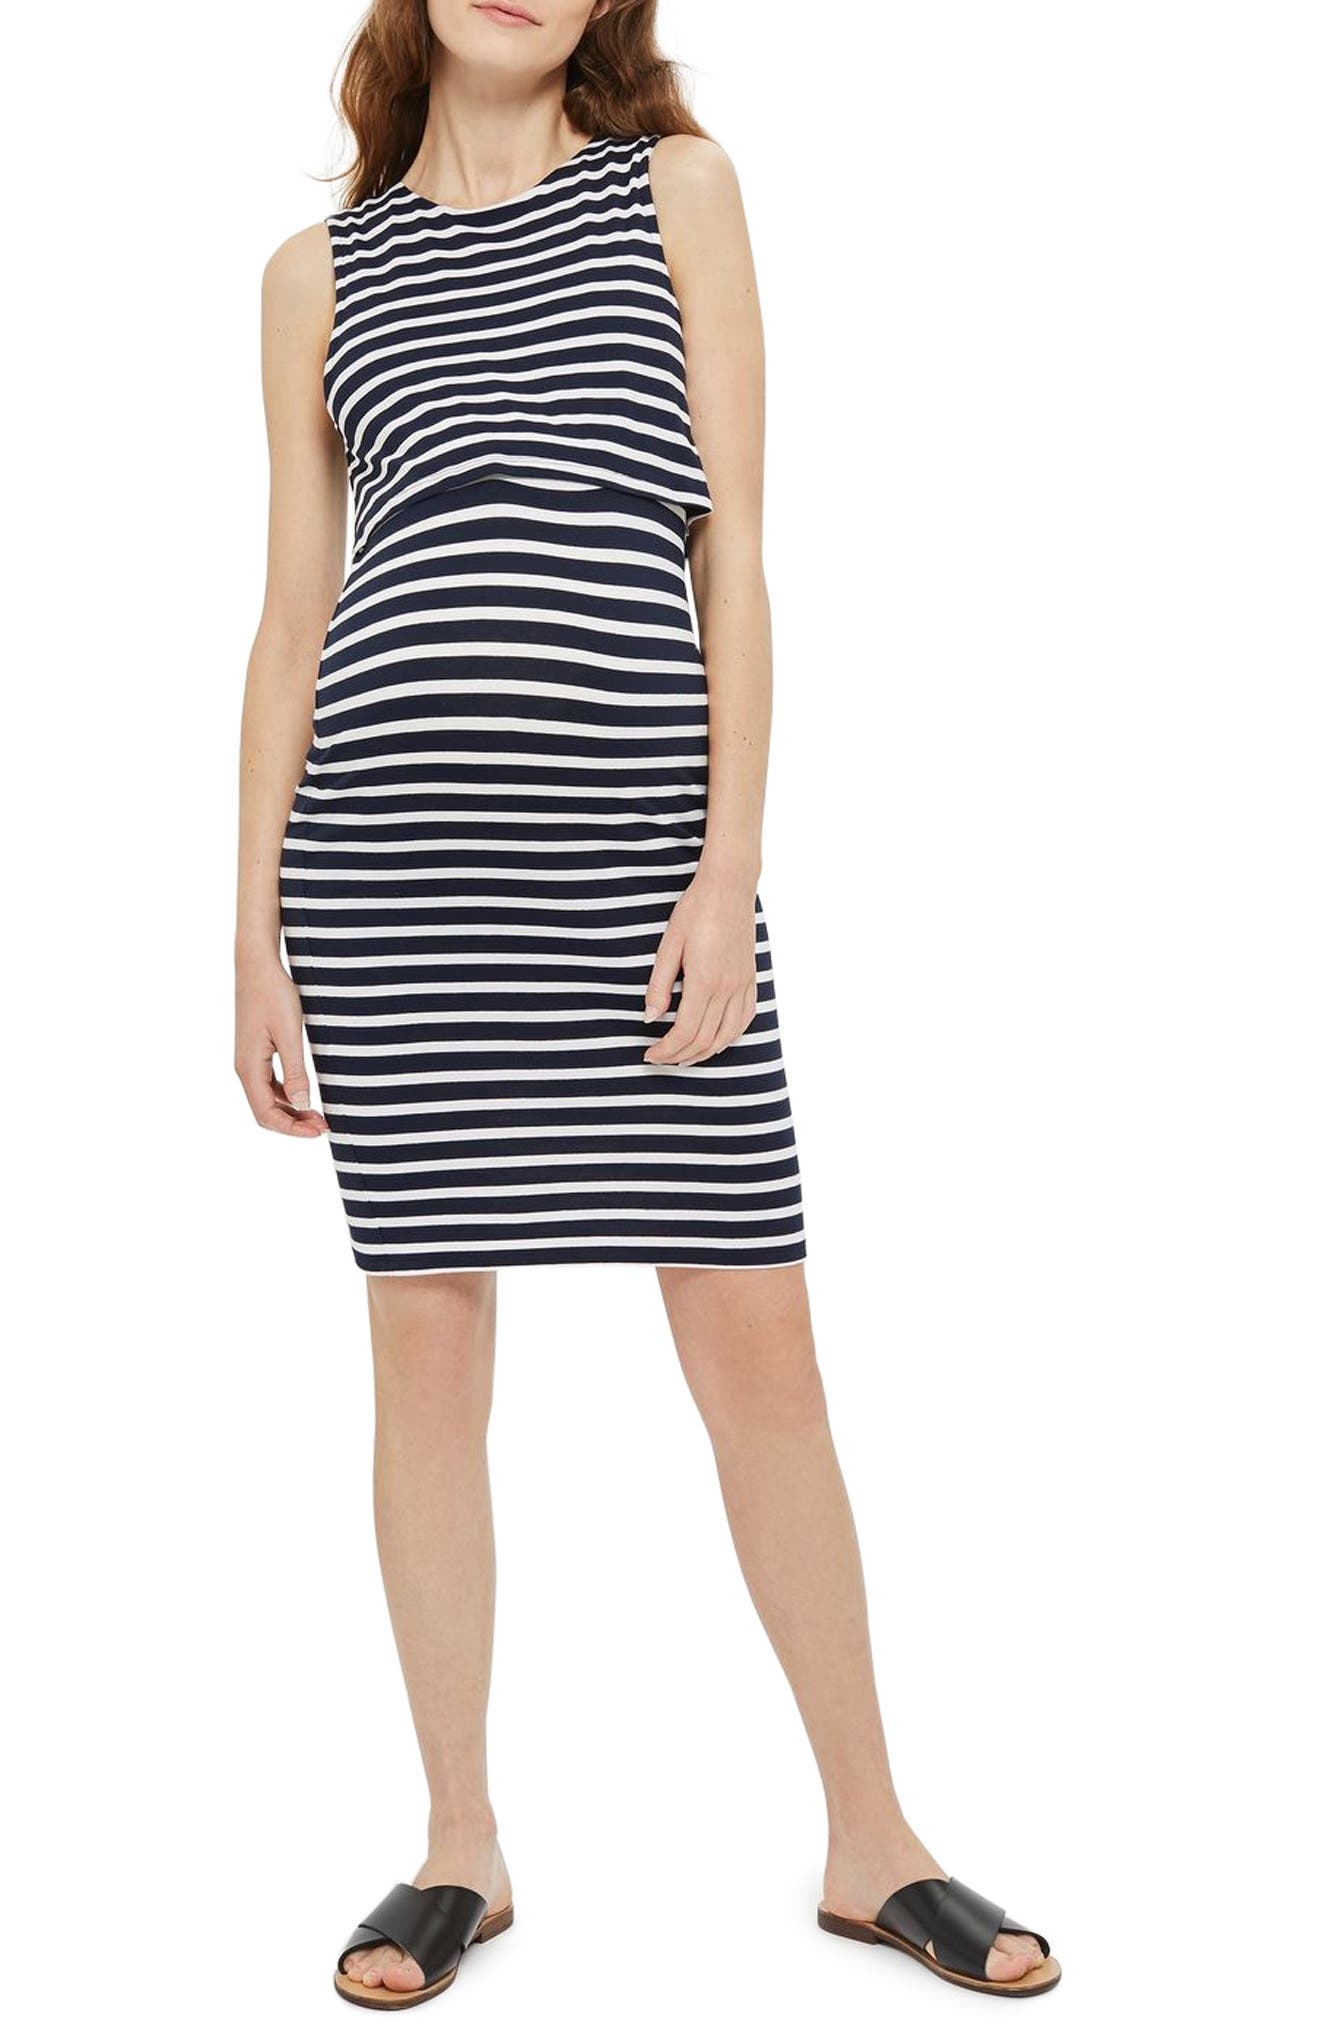 Topshop Stripe Maternity/Nursing Dress